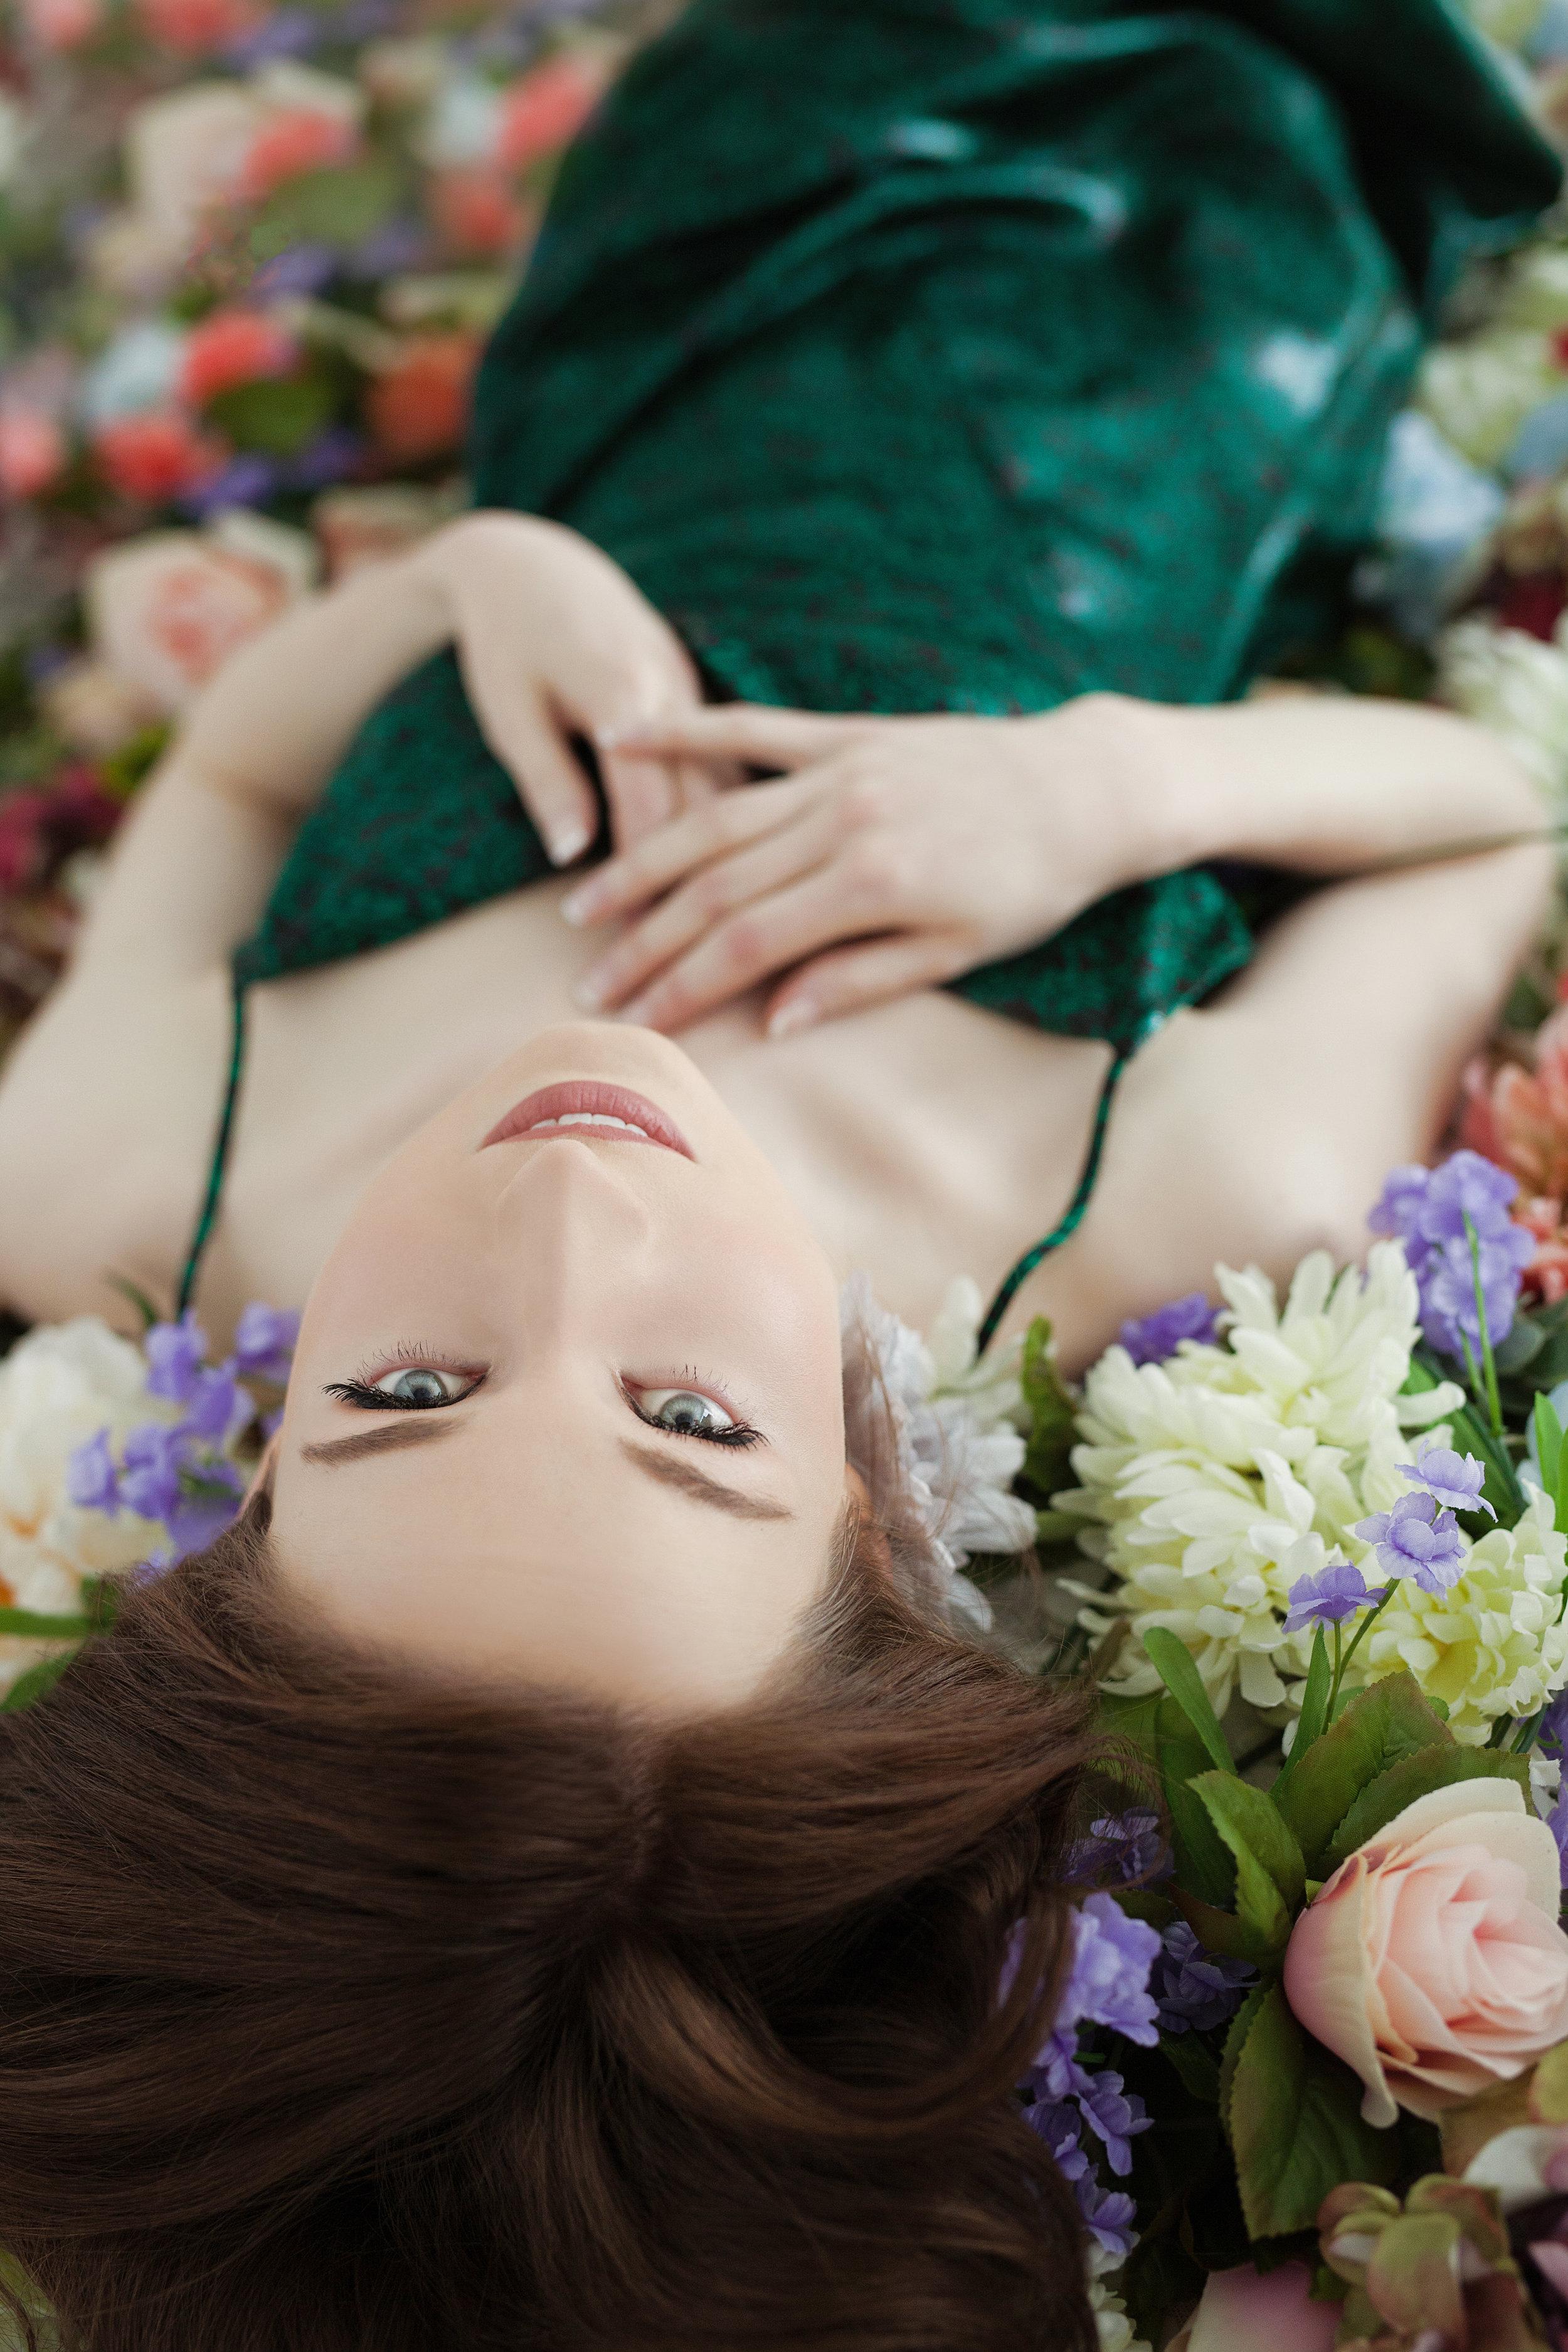 flower backdrop - portrait - photo shoot - model for a day